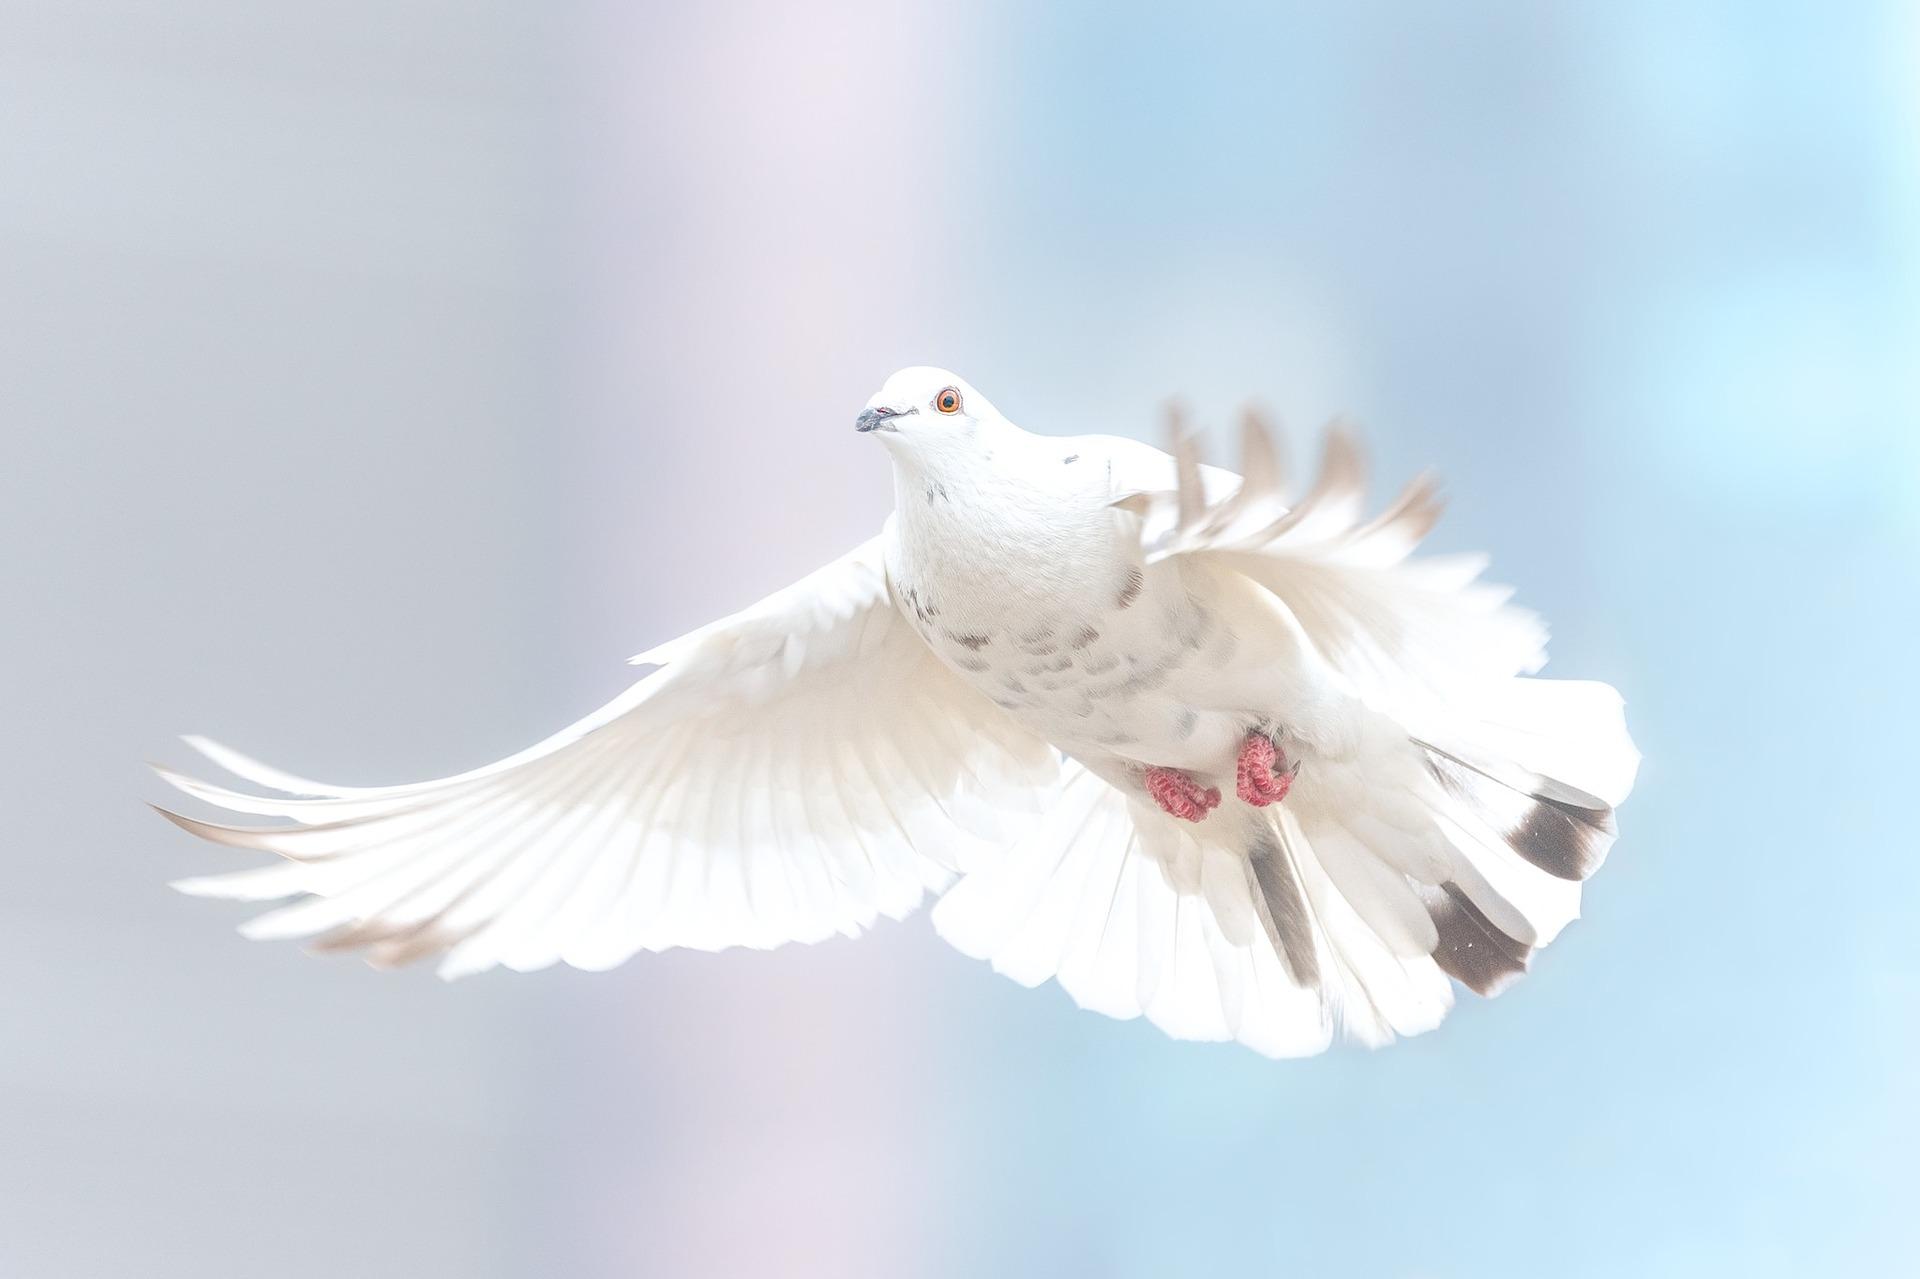 Duif, Vrijheid